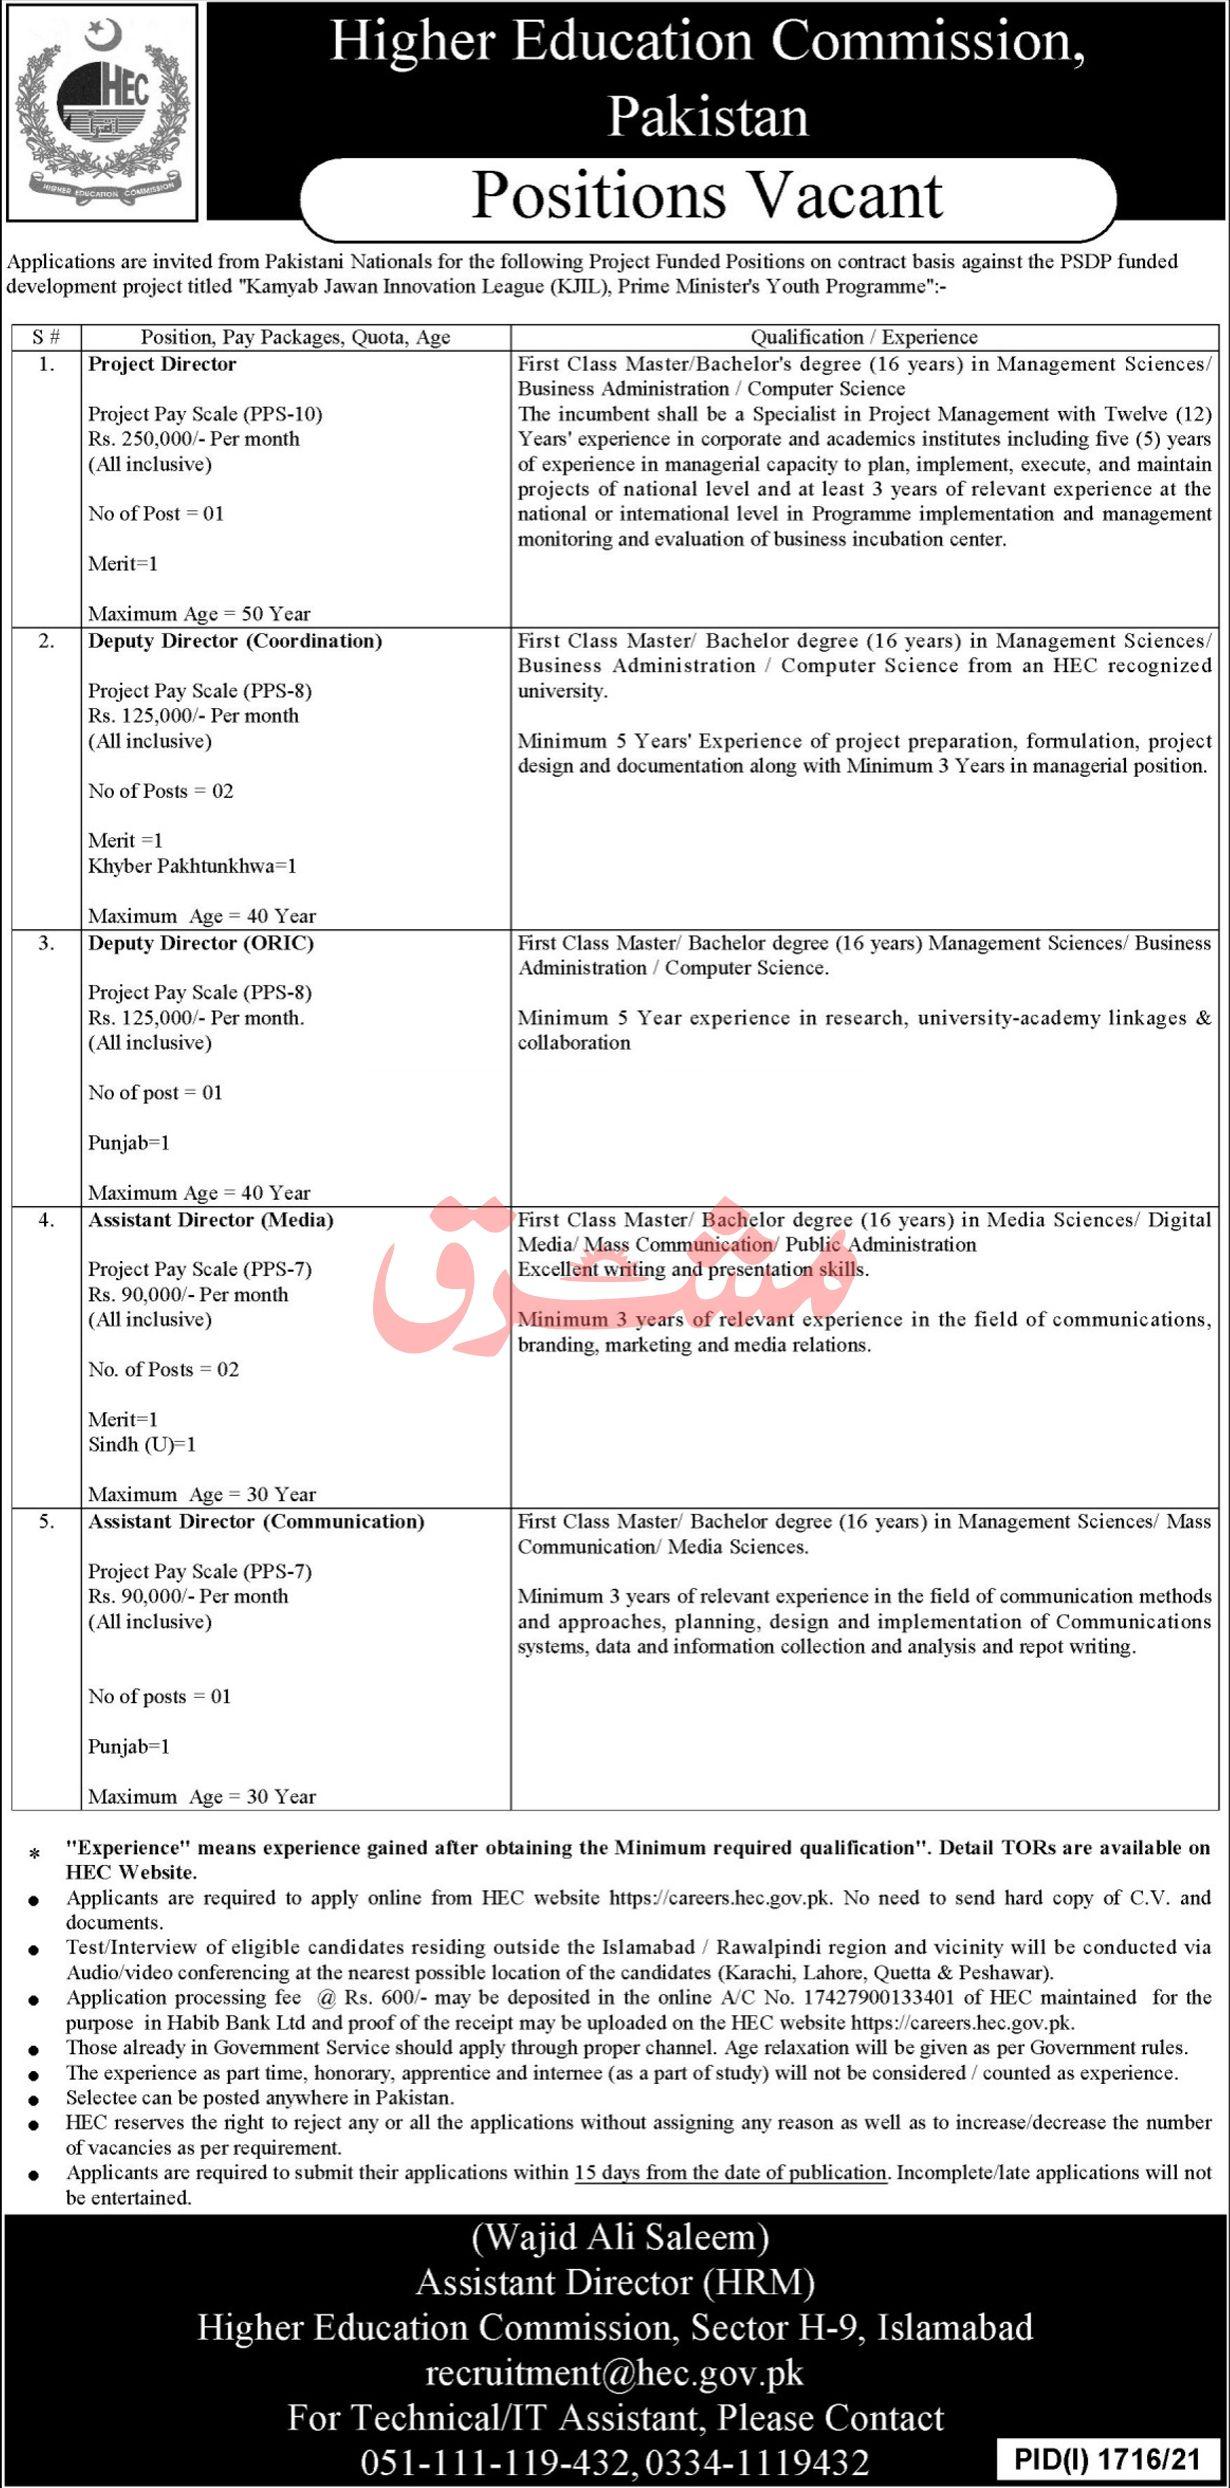 Higher Education Commission HEC Pakistan Vacancies 2021 – 3